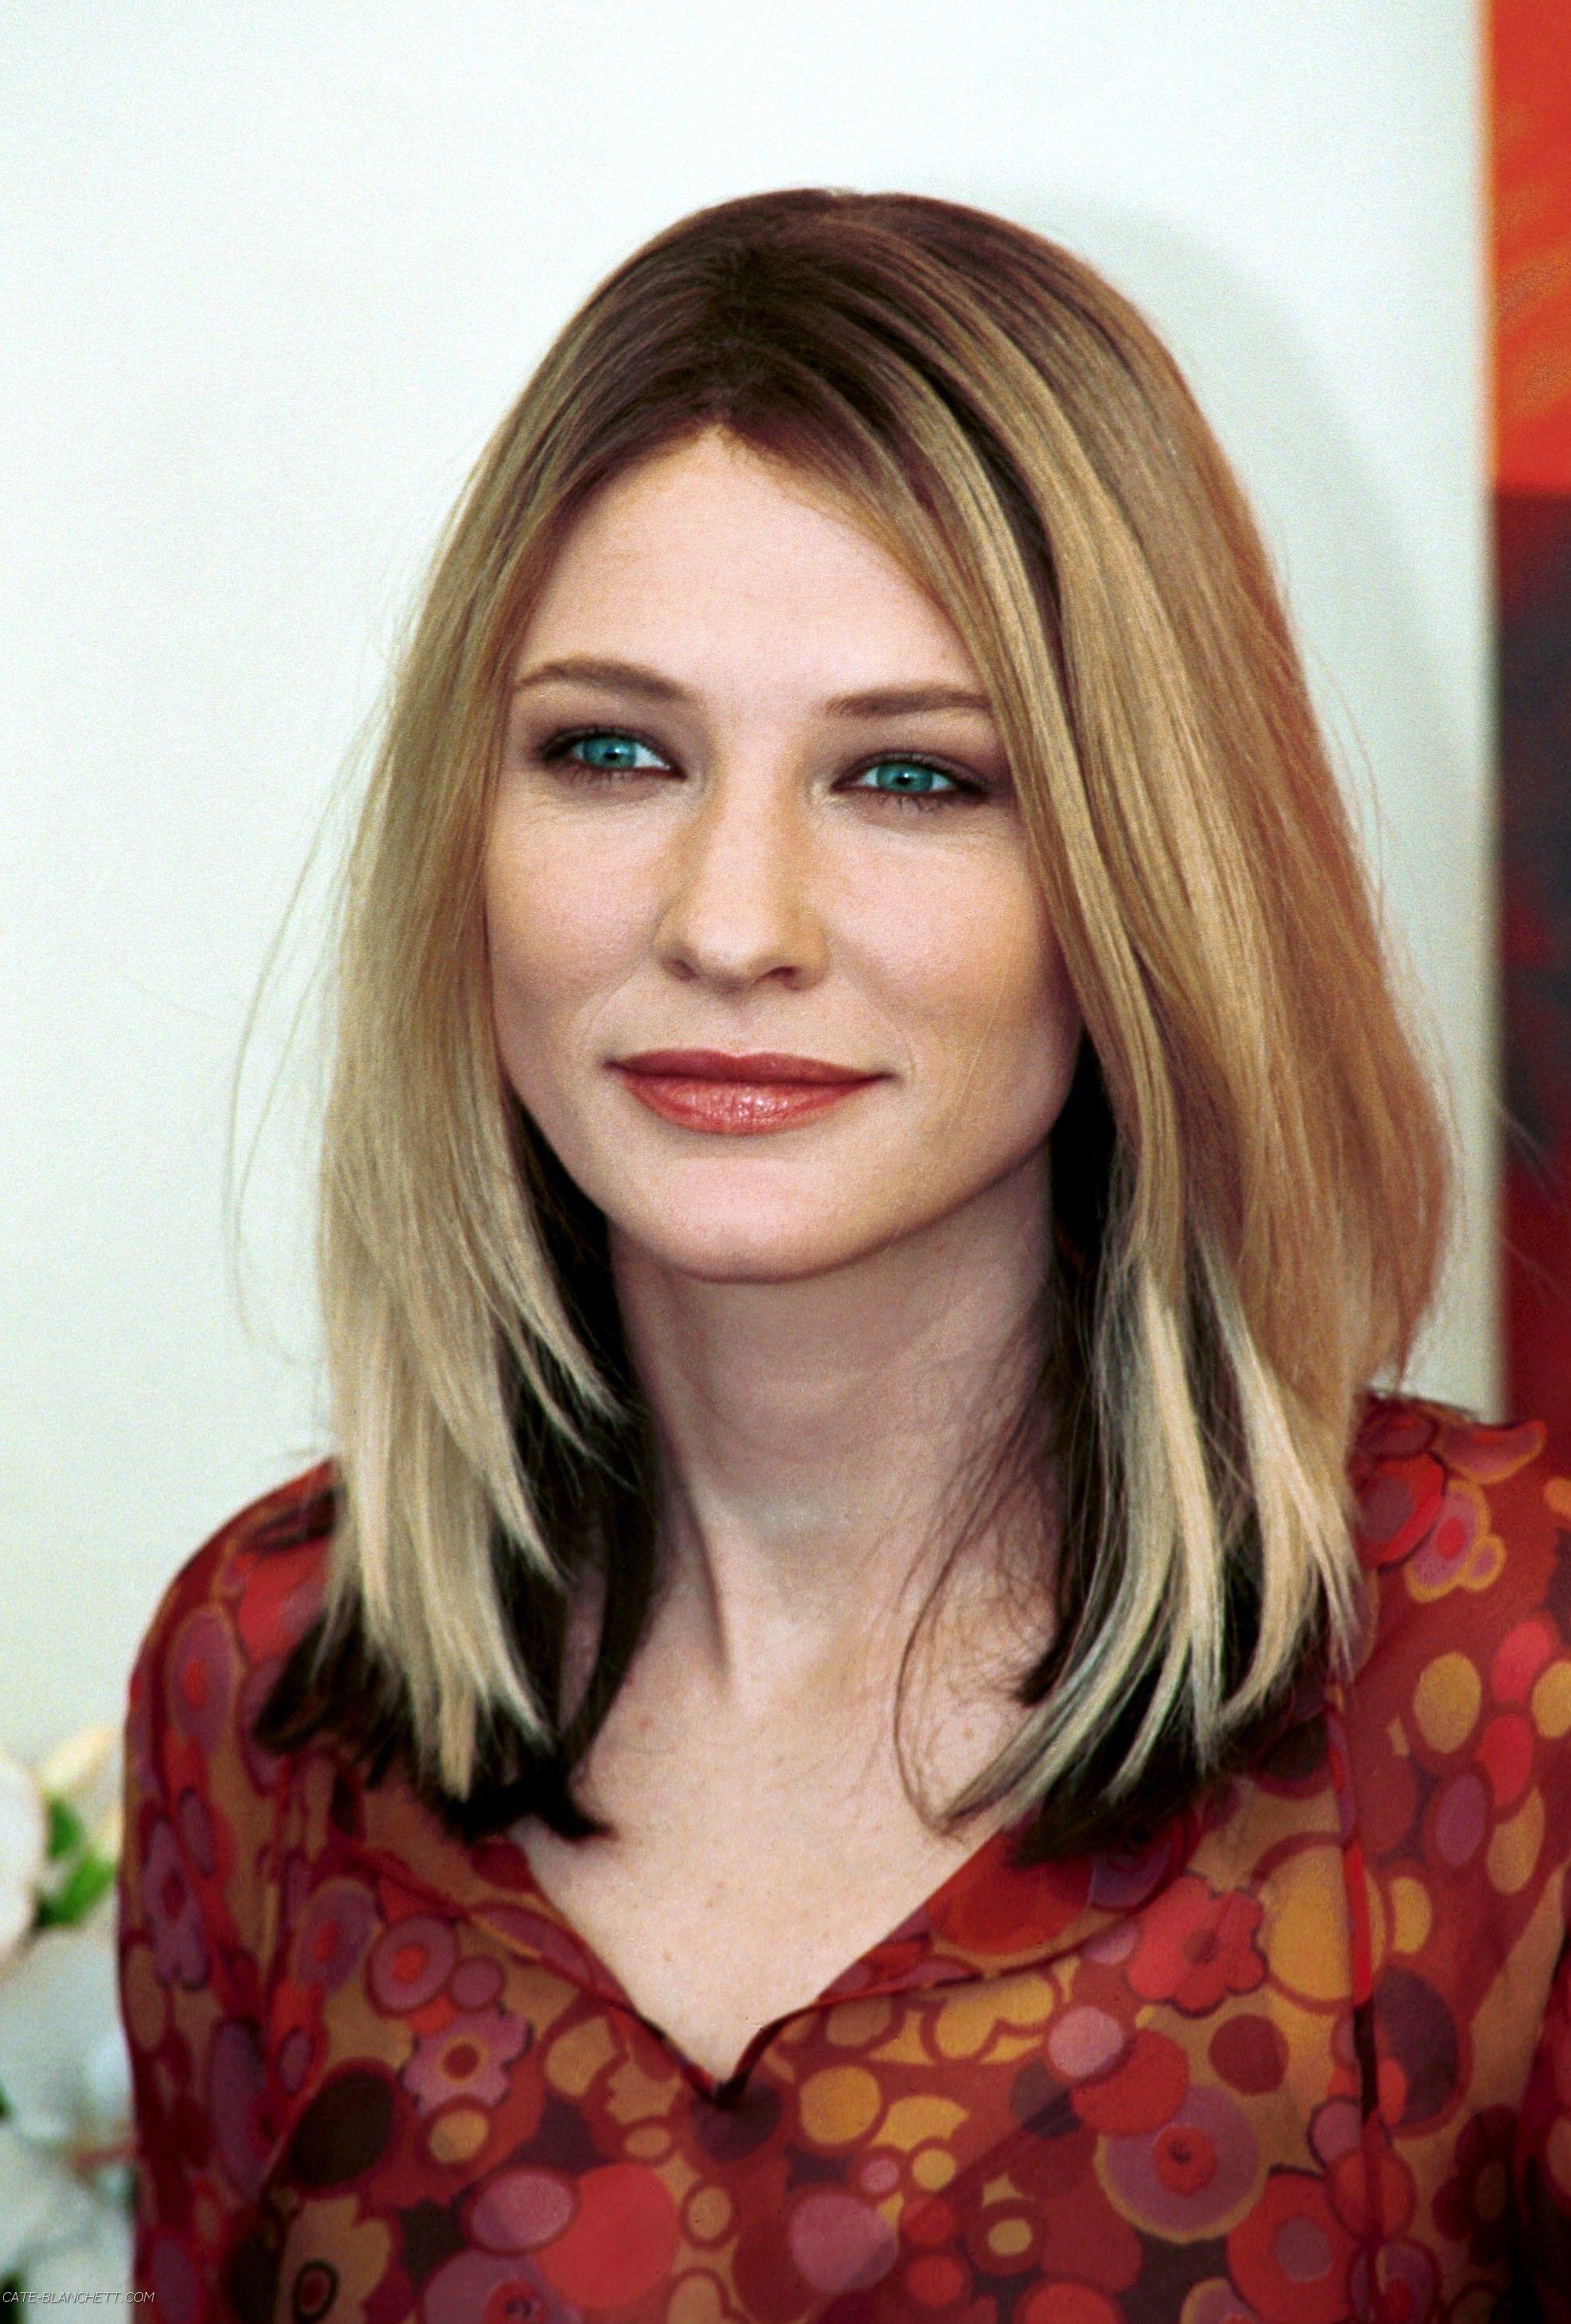 Pin By Naci Memis On My Saves In 2020 Cate Blanchett International Film Festival Catherine Elise Blanchett